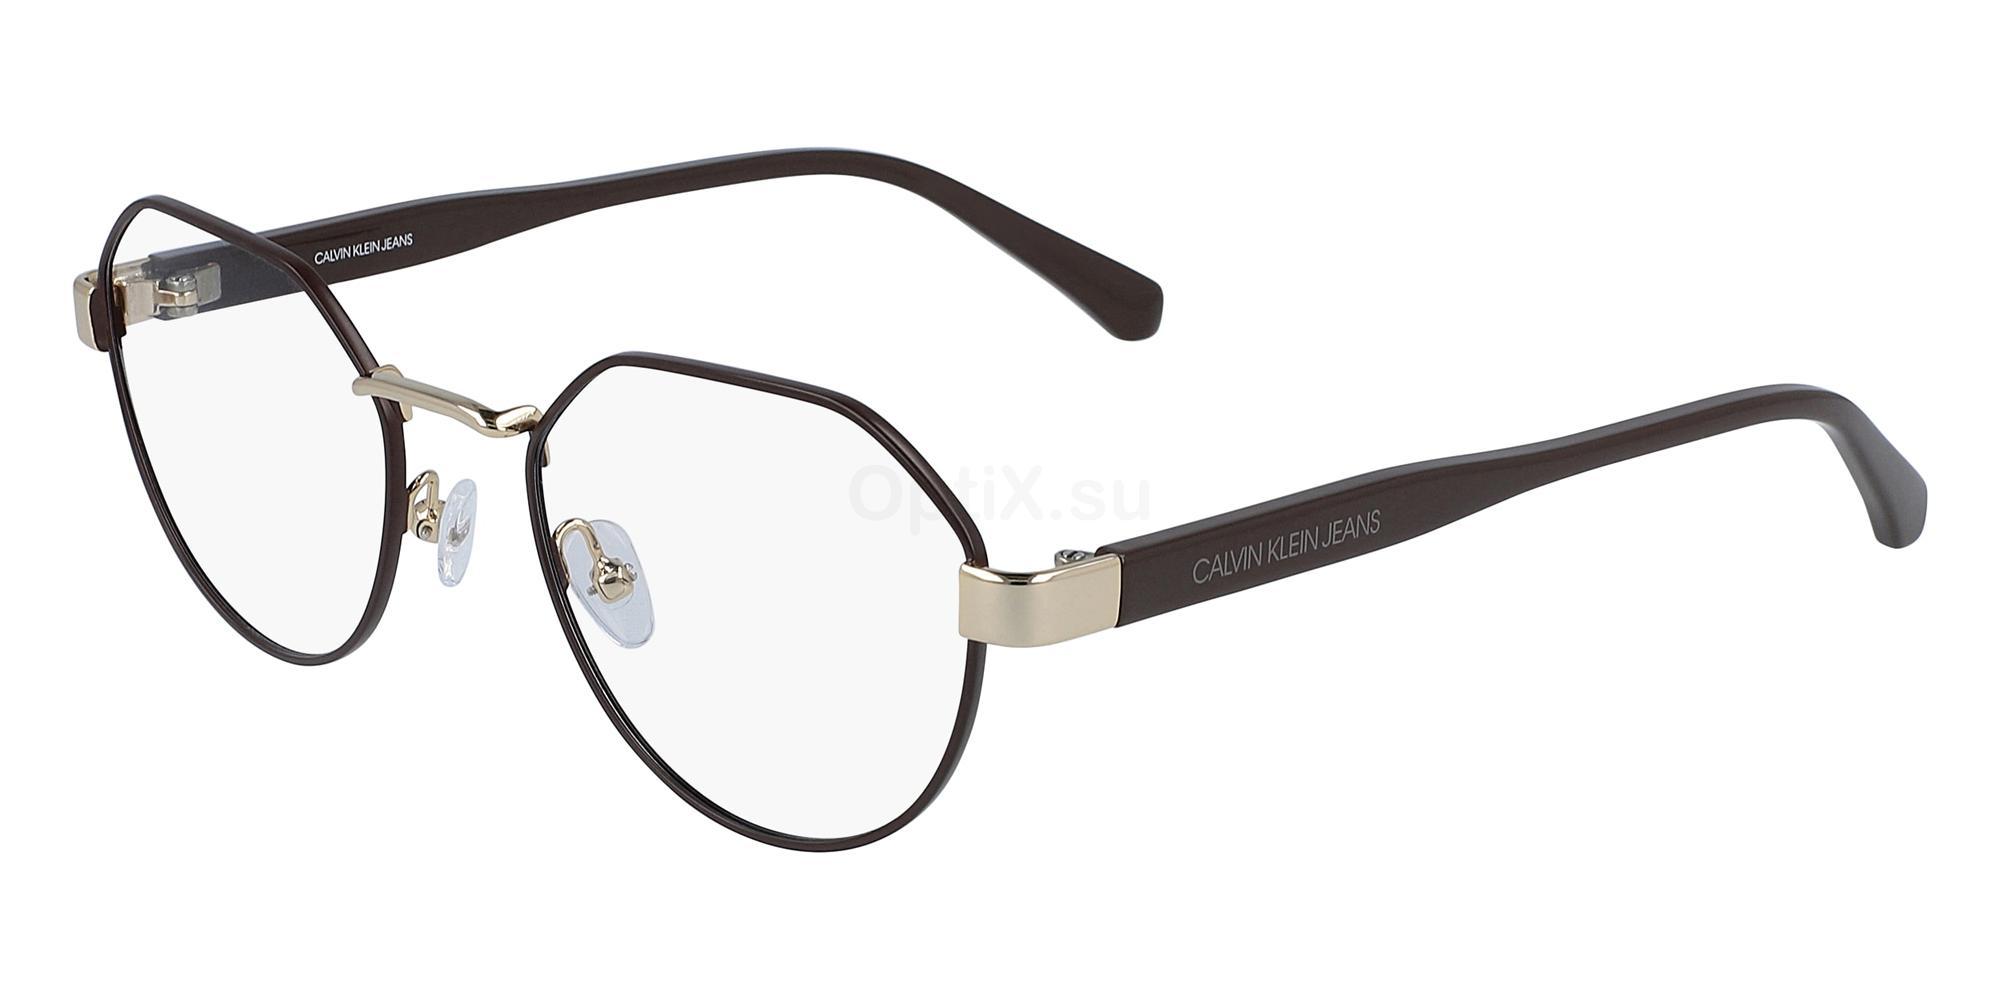 210 CKJ19300 Glasses, Calvin Klein Jeans